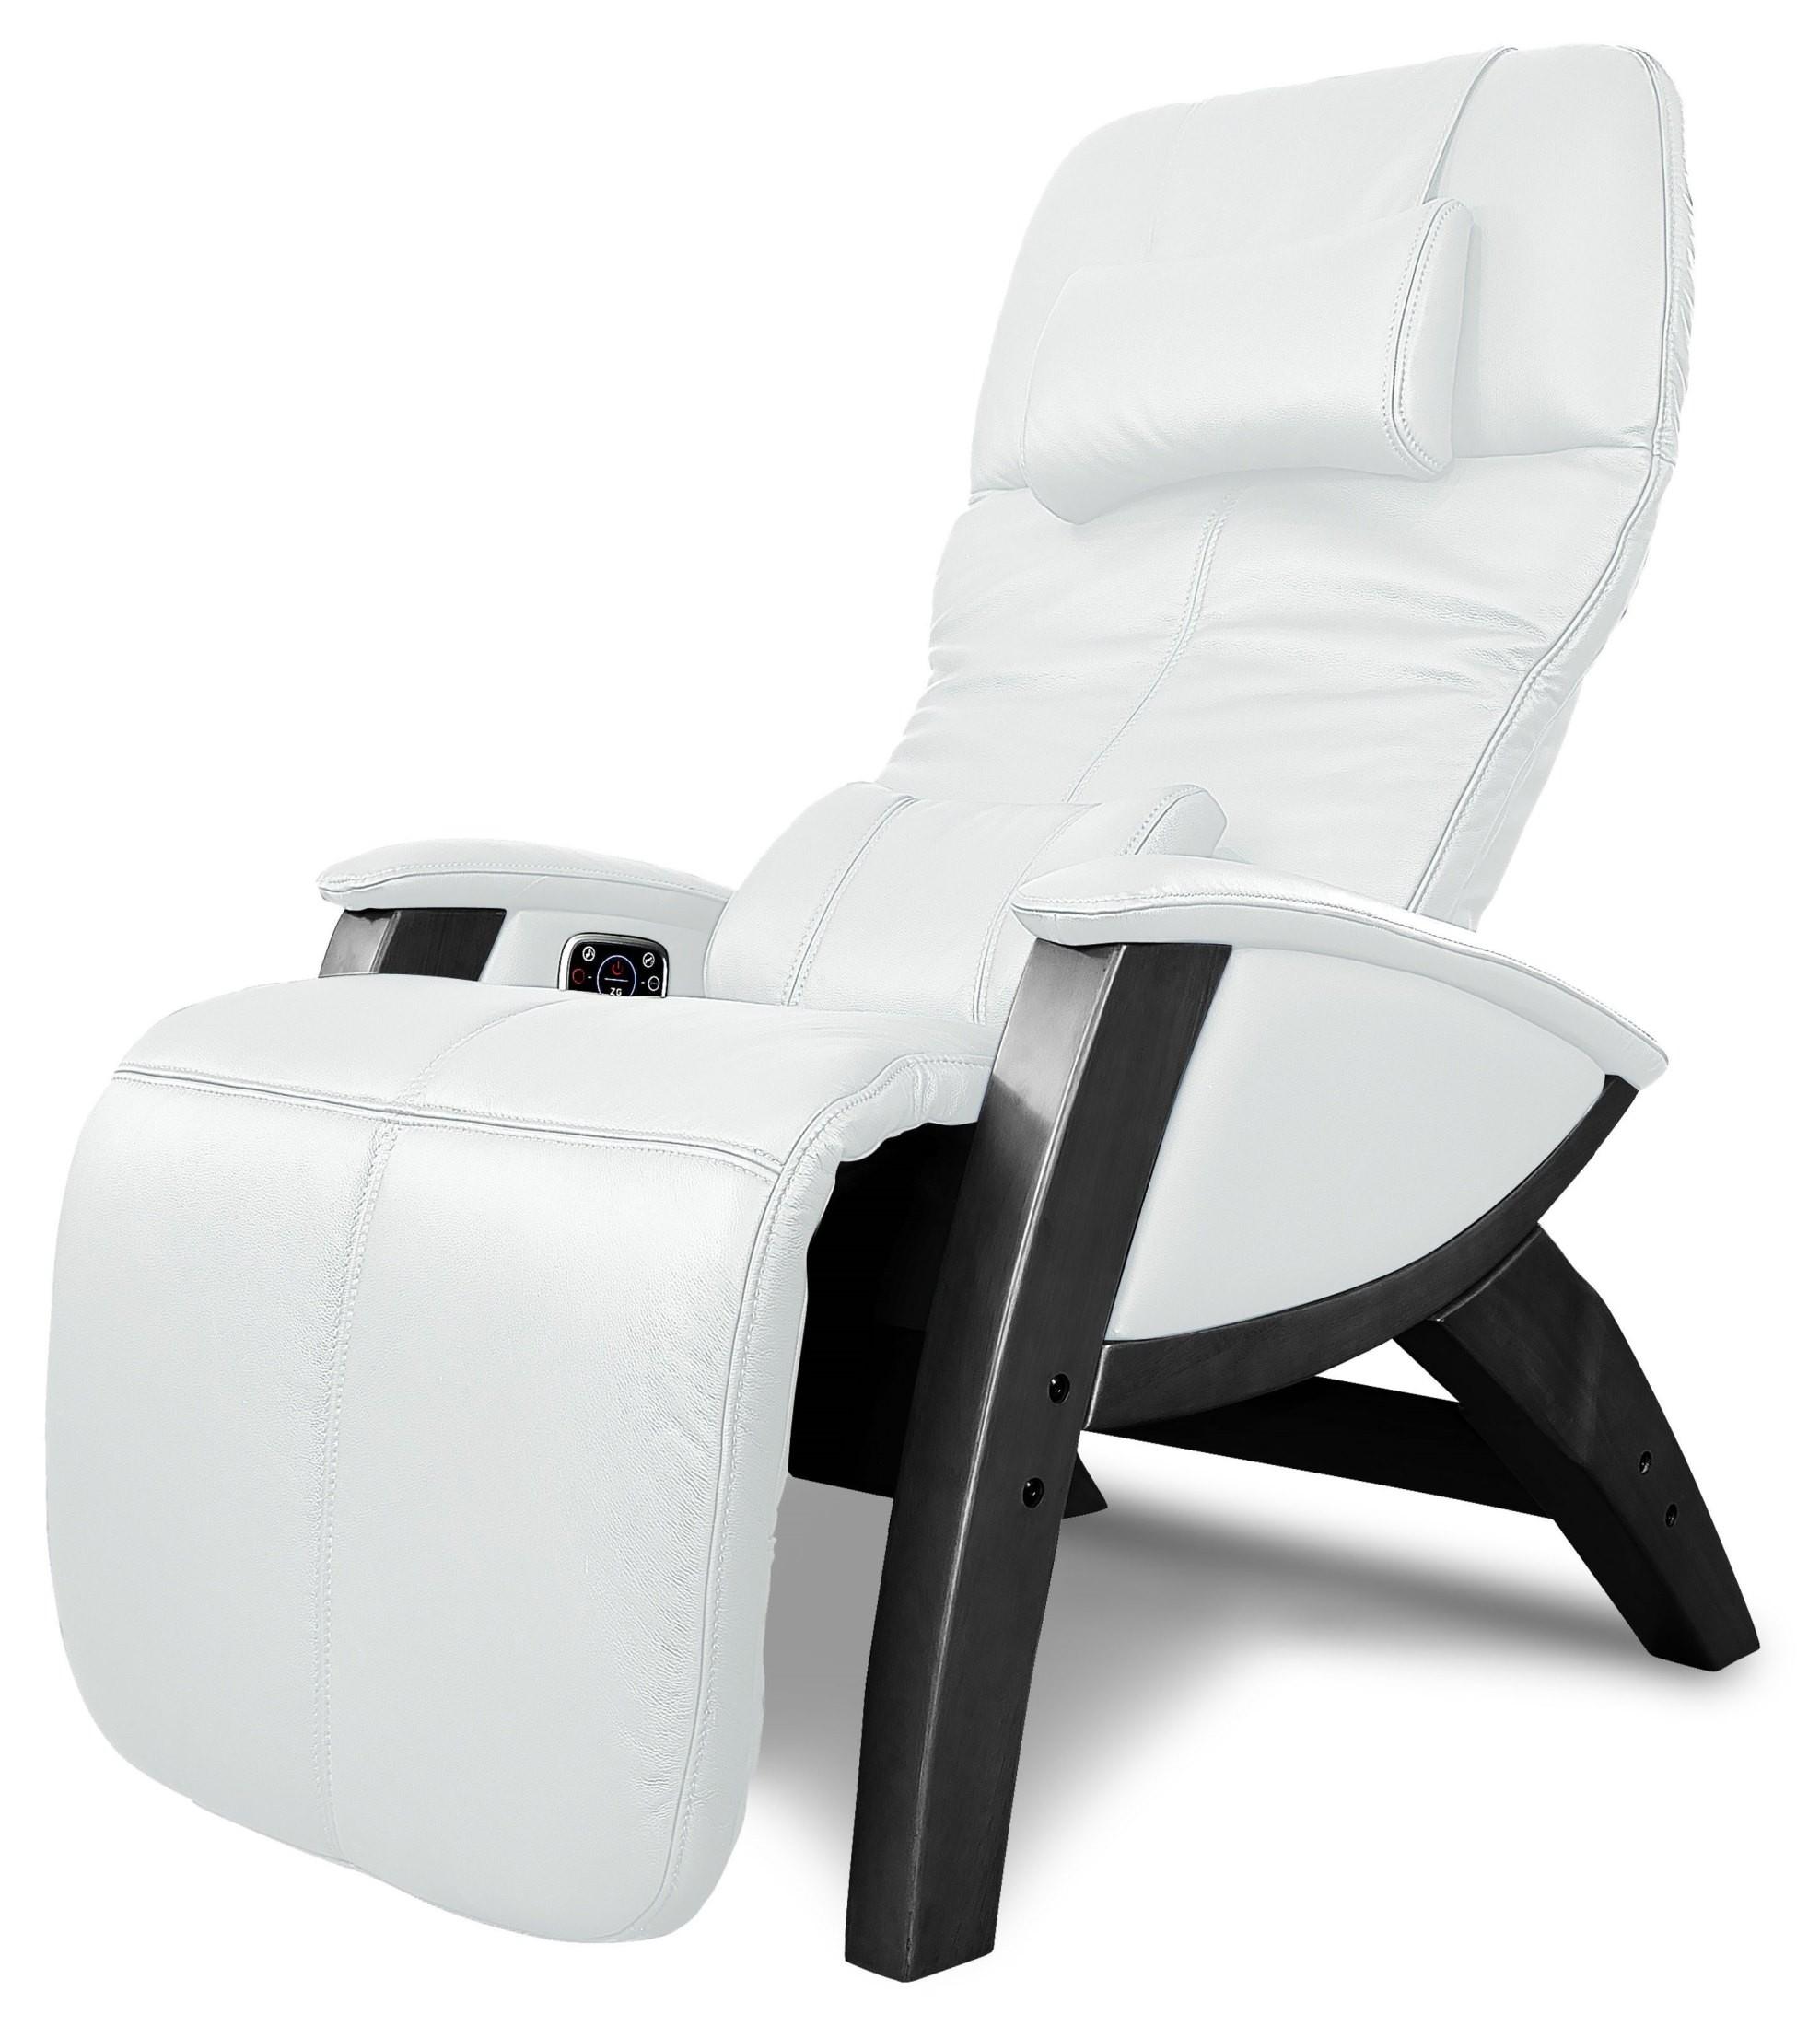 Svago ZG Ivory Chair from Svago SV40130BL  Coleman